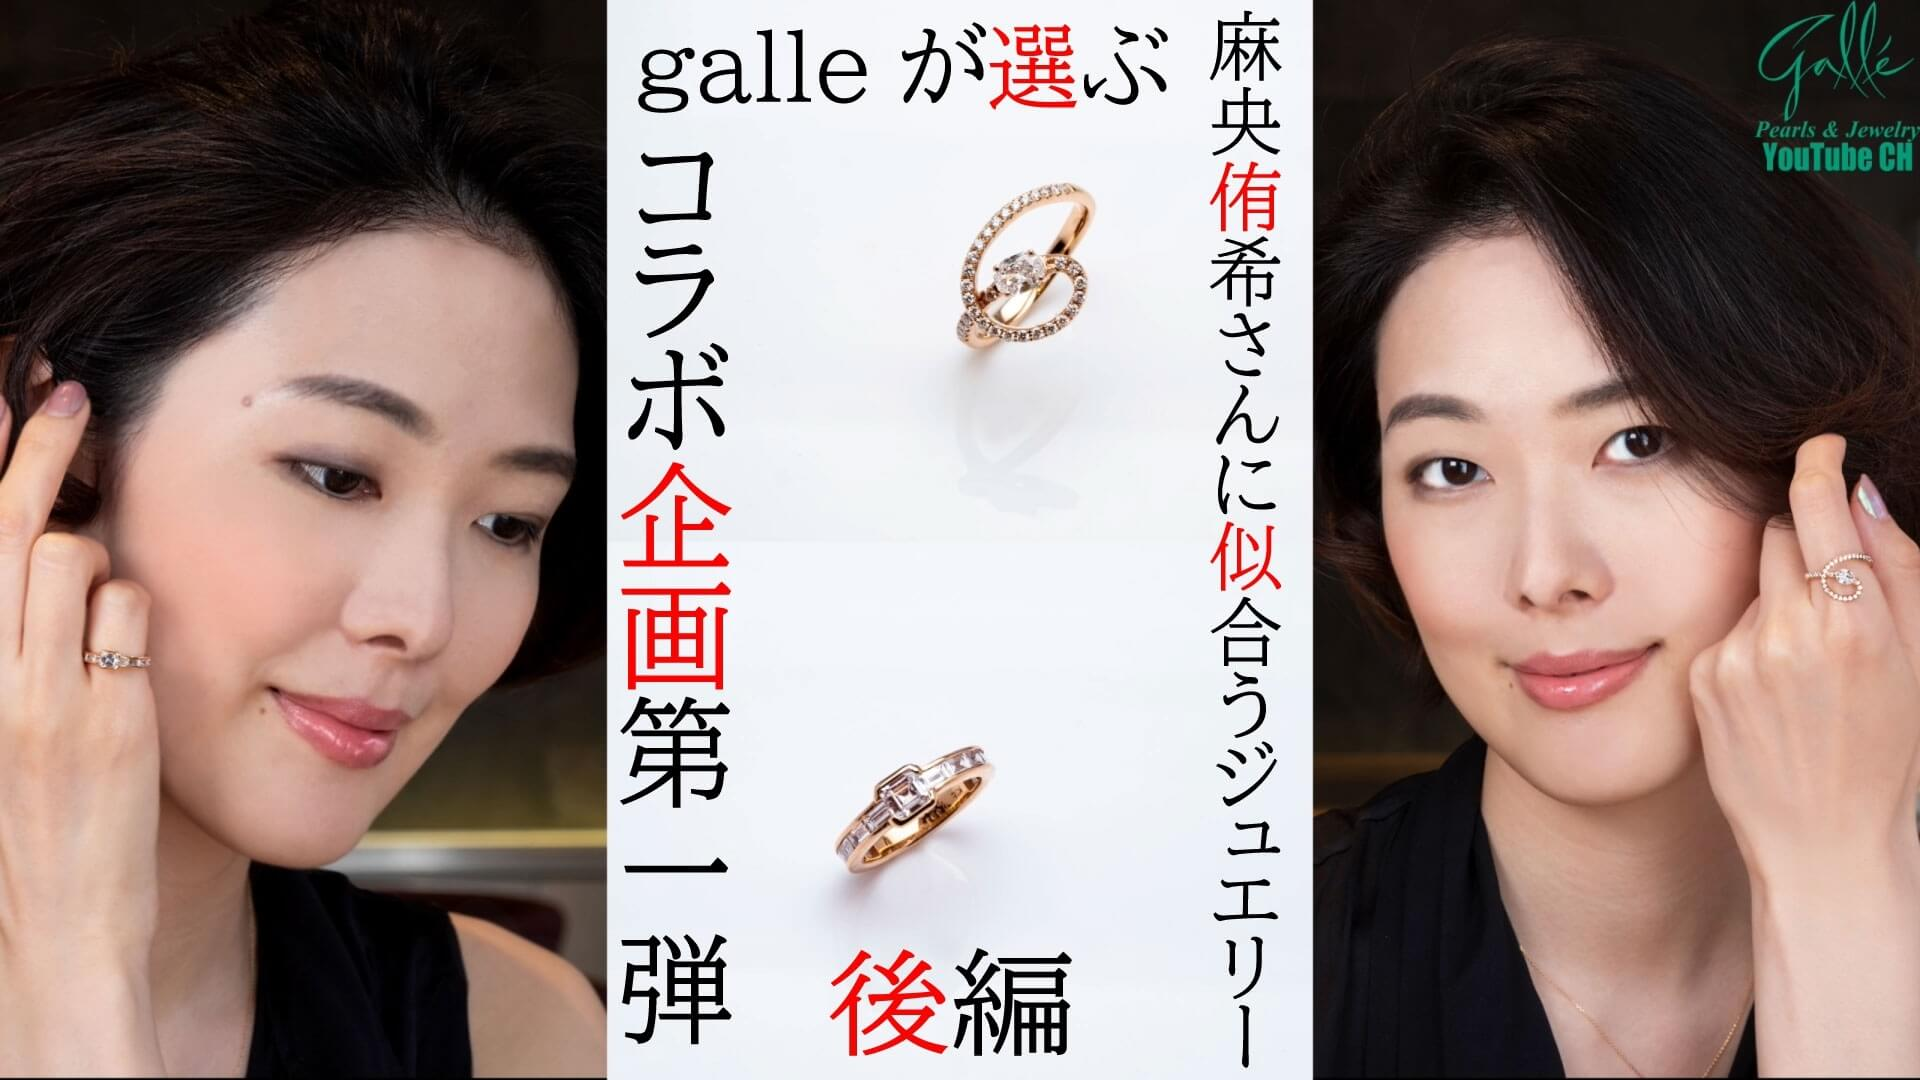 Galle × 麻央 侑希コラボ企画第一弾後編